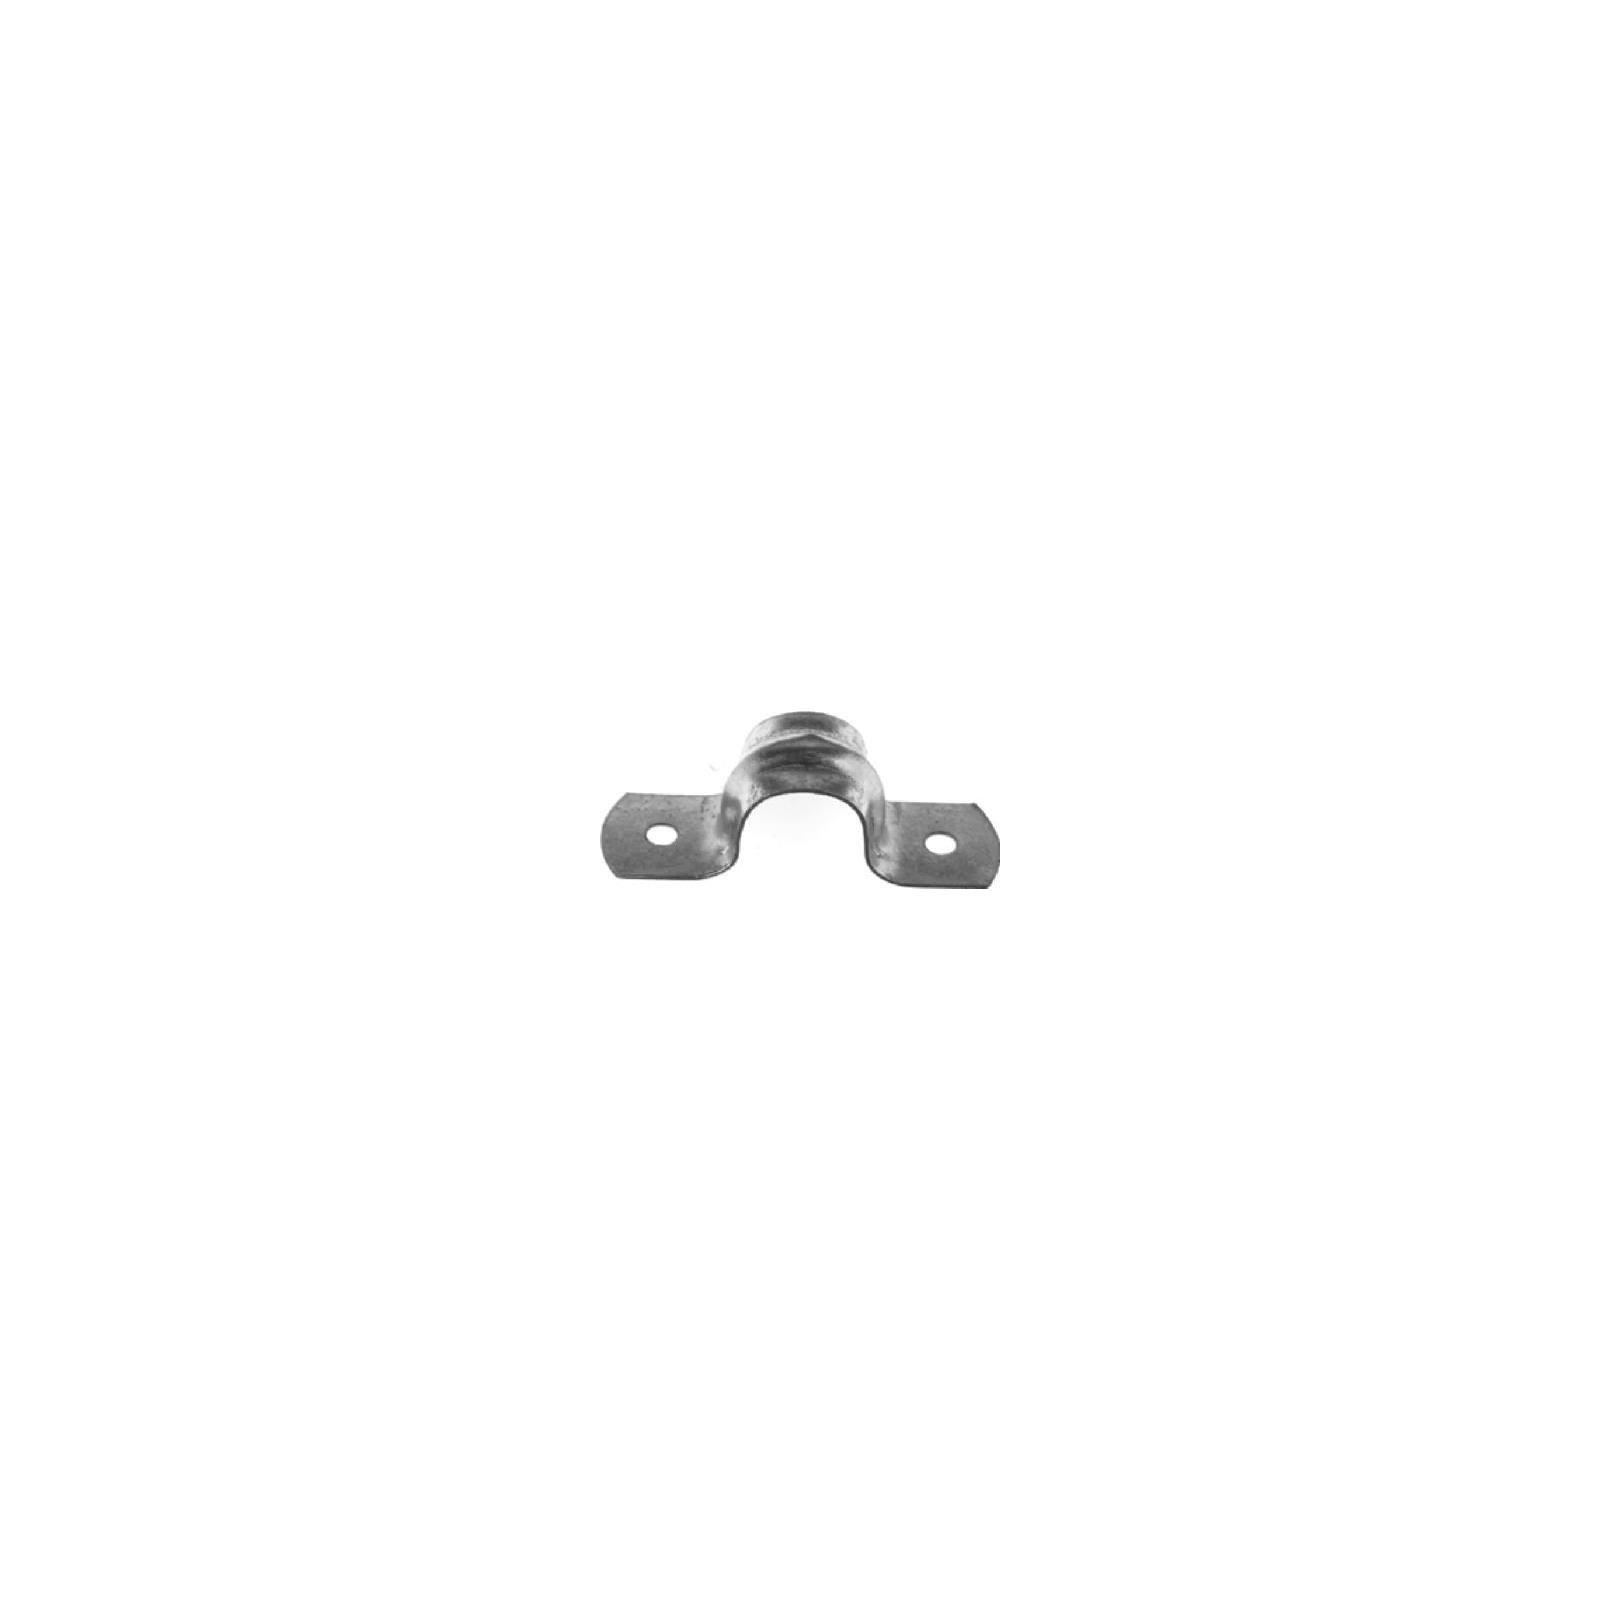 Halex/Scott Fetzer 91205 1/2-Inch 2-Hole Steel Rigid Conduit Strap - Quantity 200